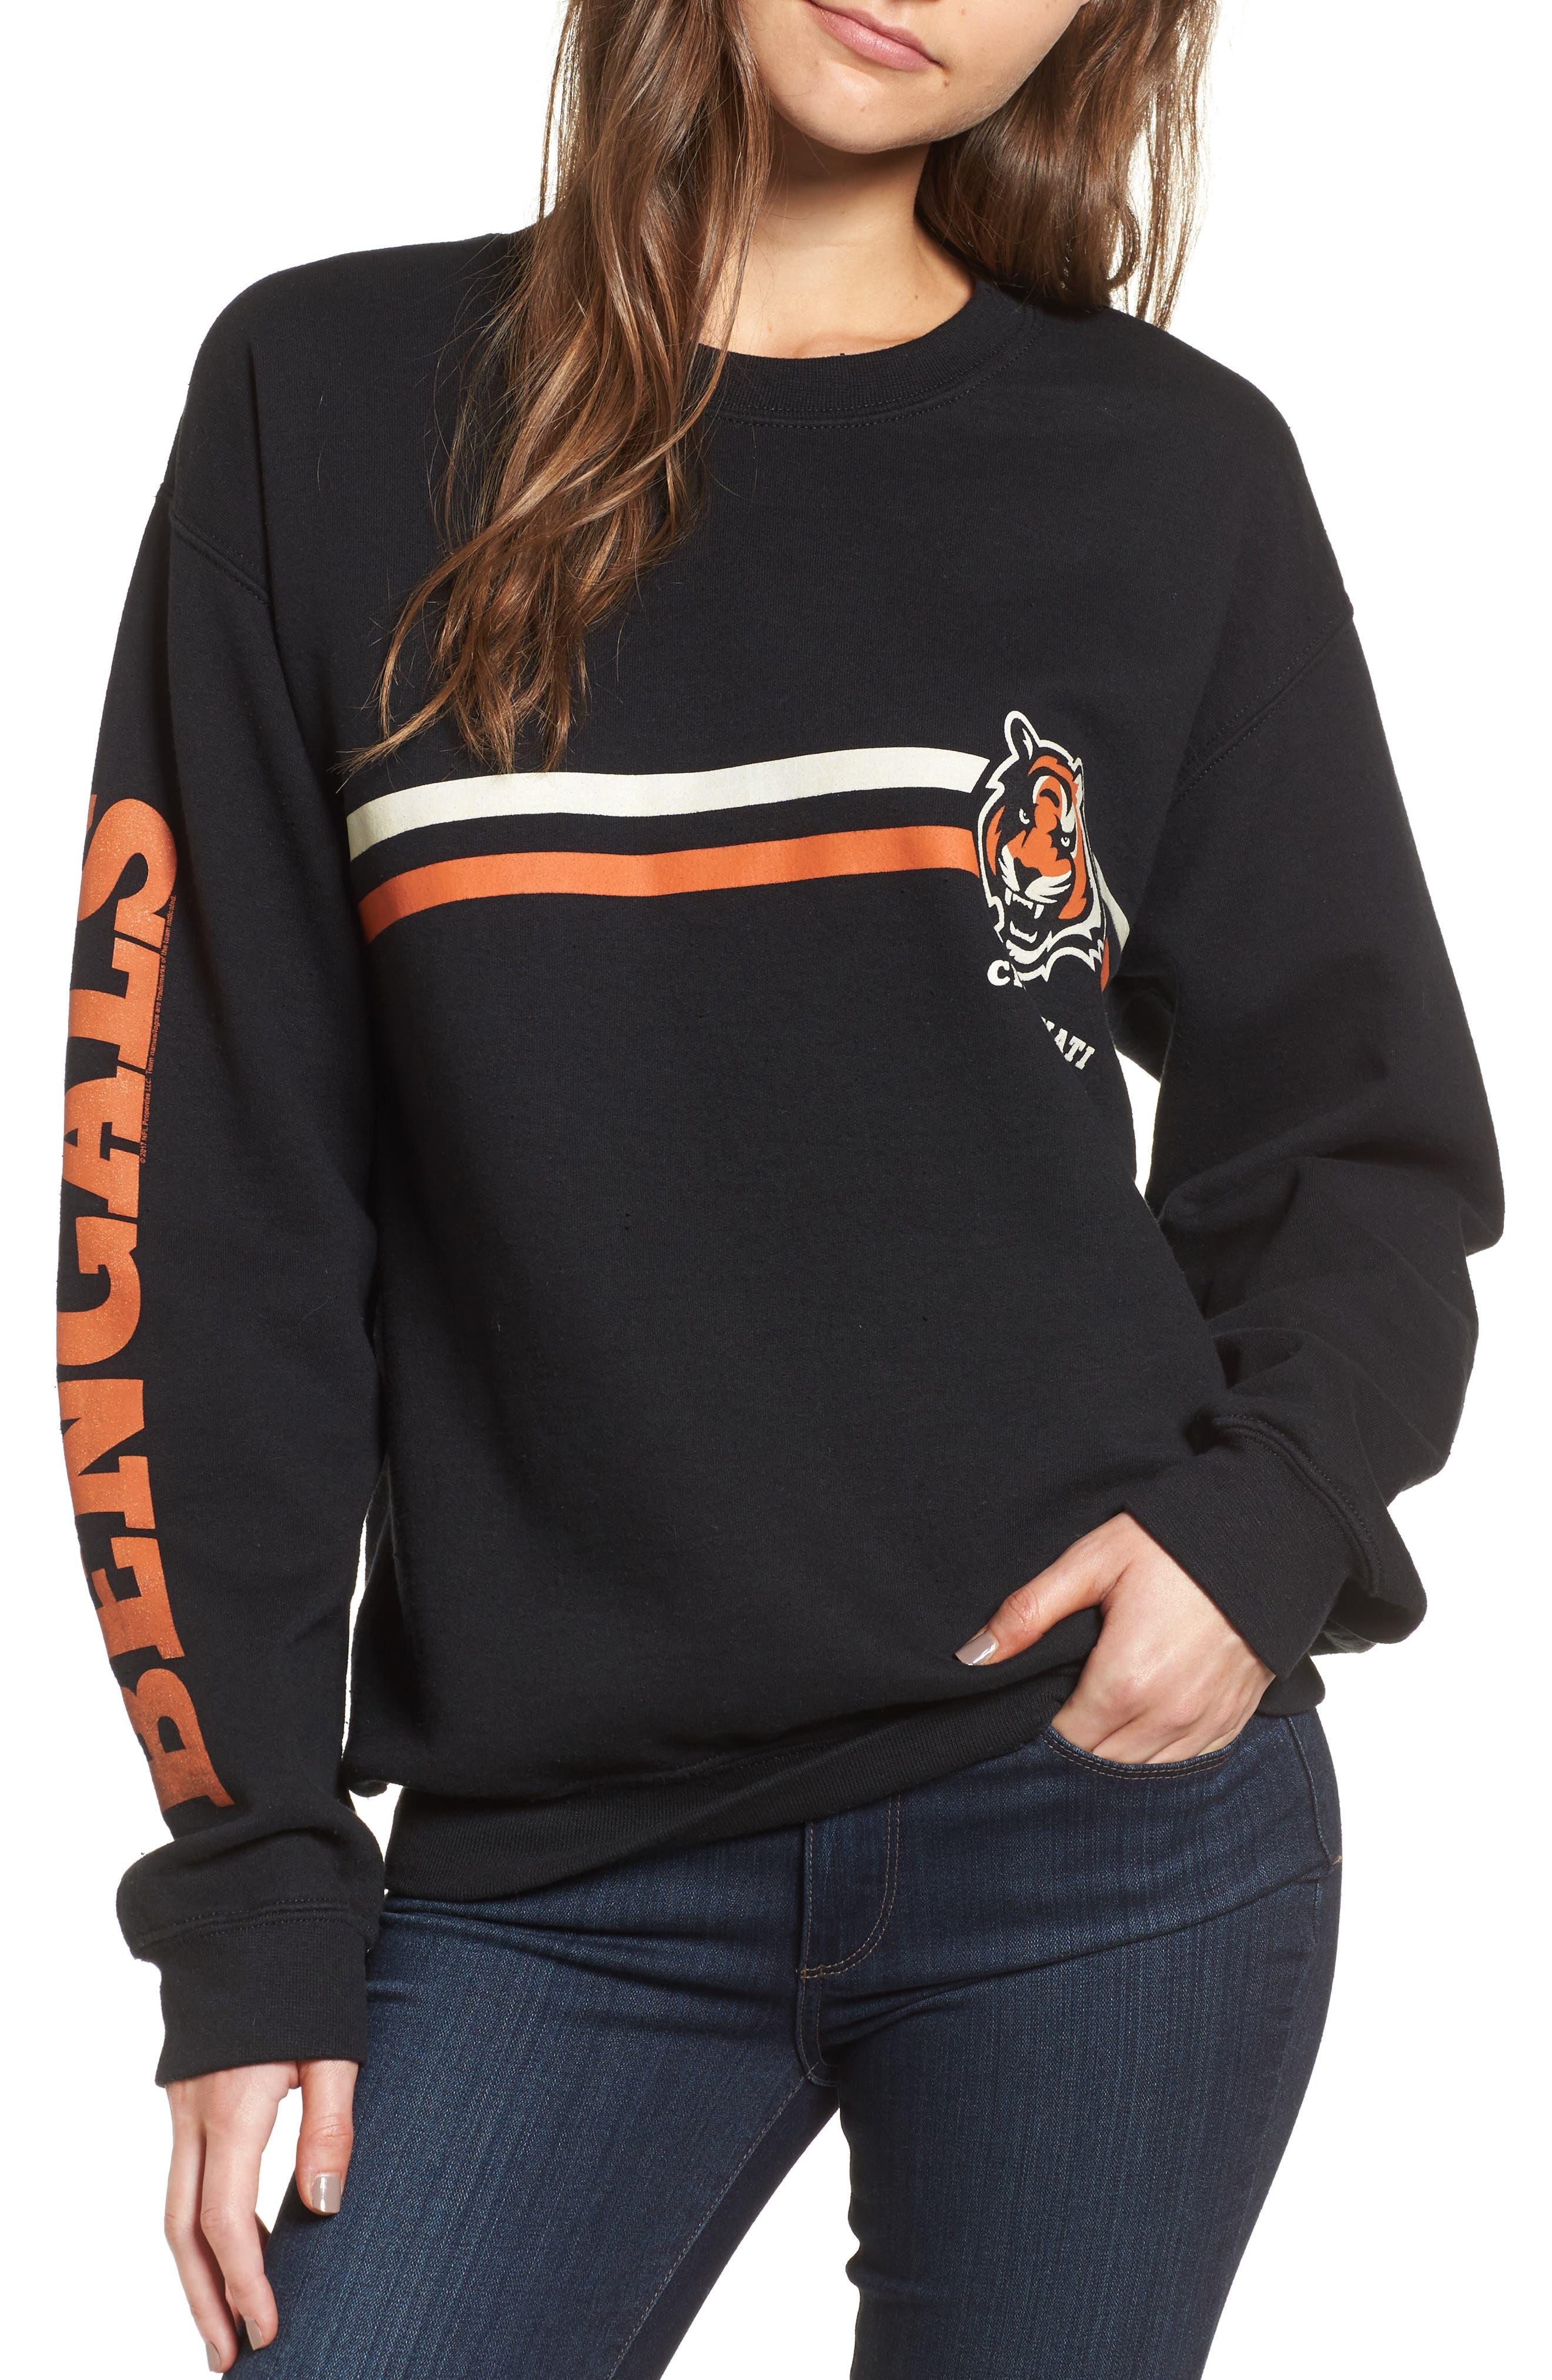 Junk Food Retro NFL Team Sweatshirt